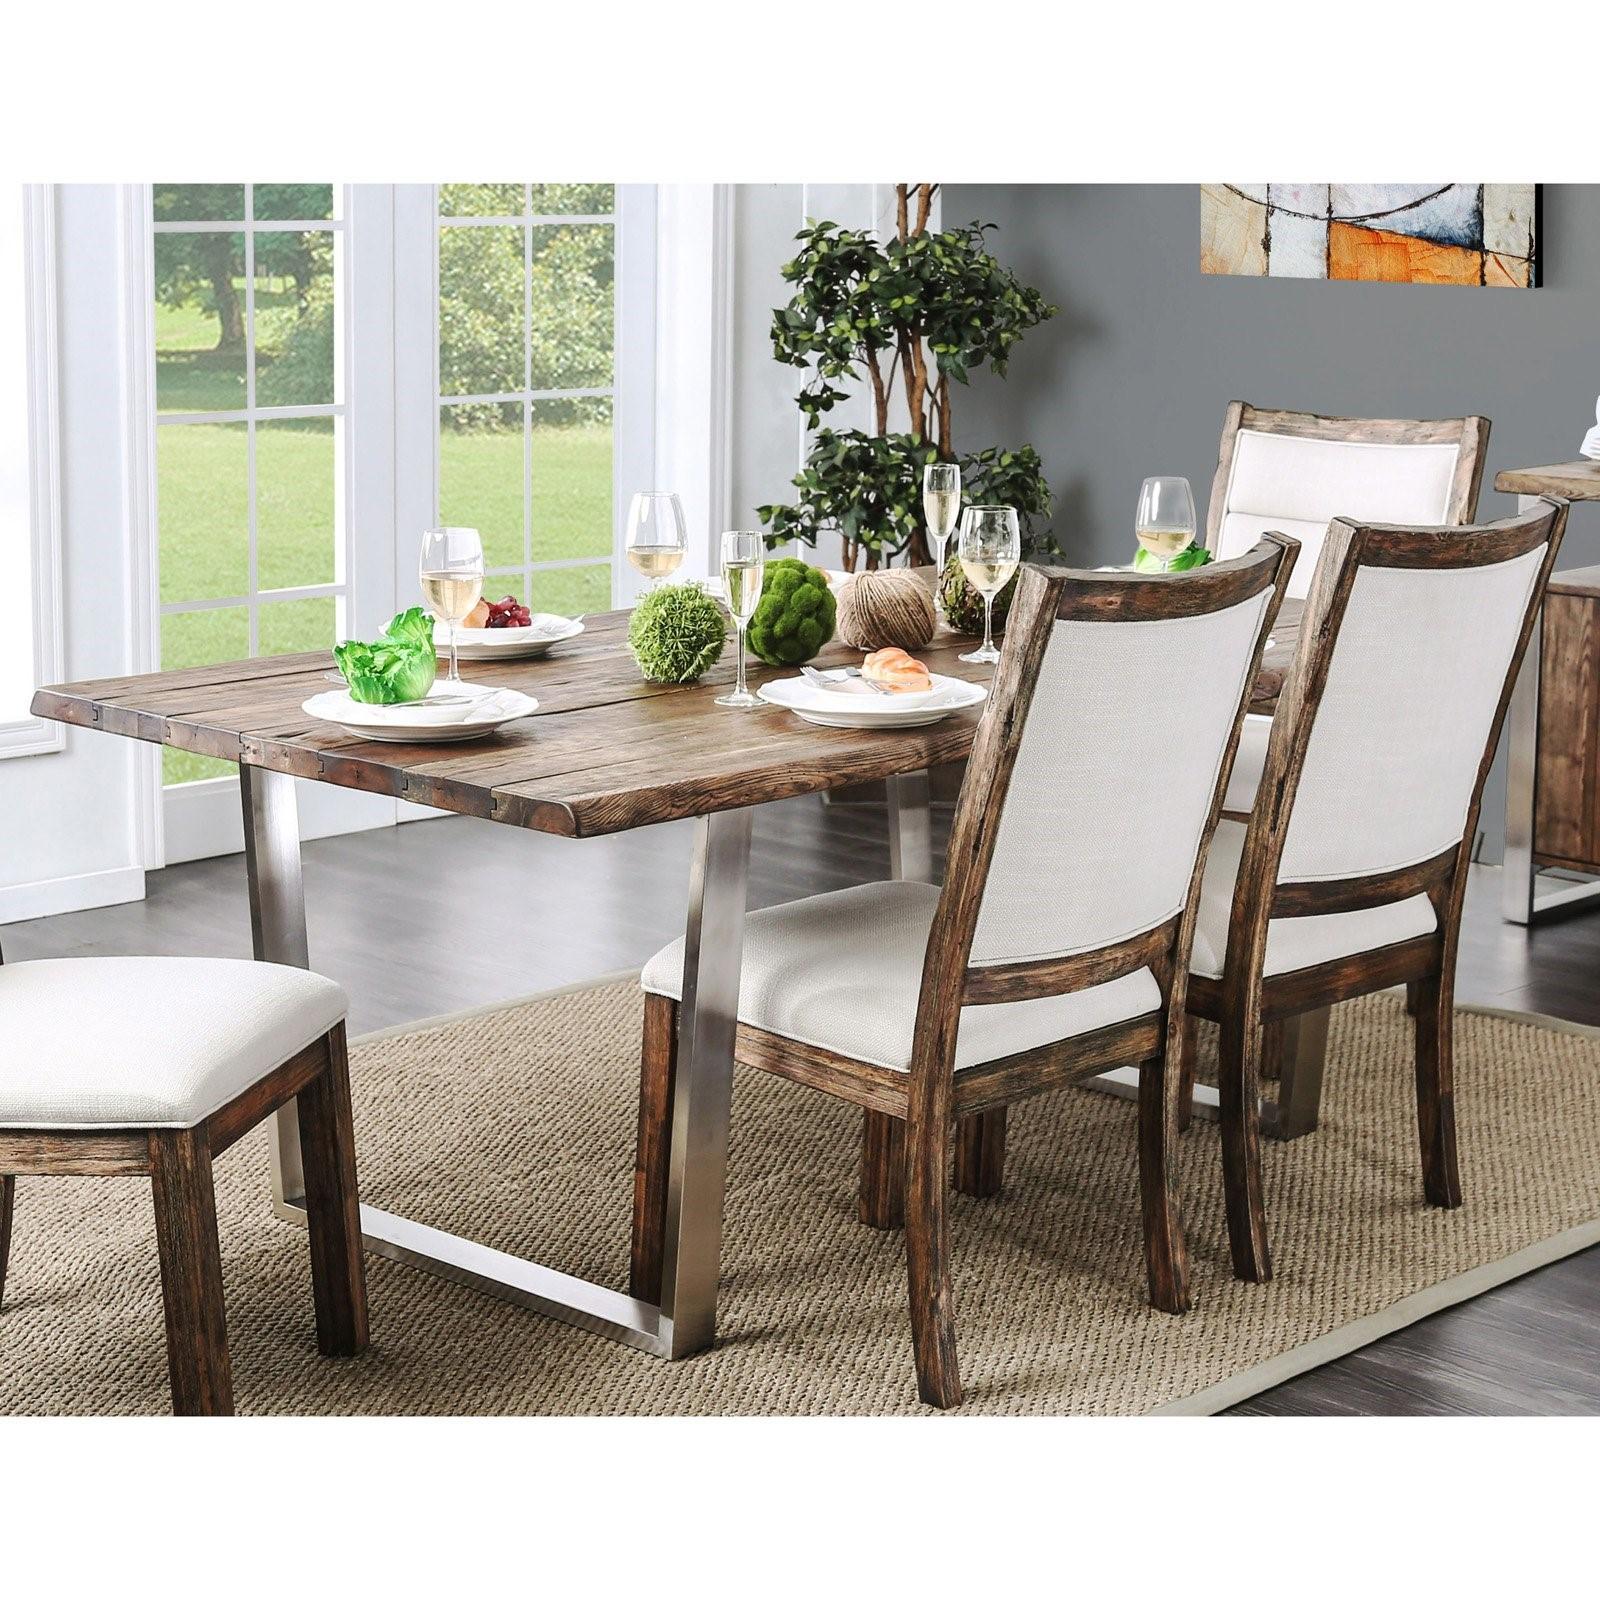 Furniture of America Kadin Rustic Industrial Dining Table